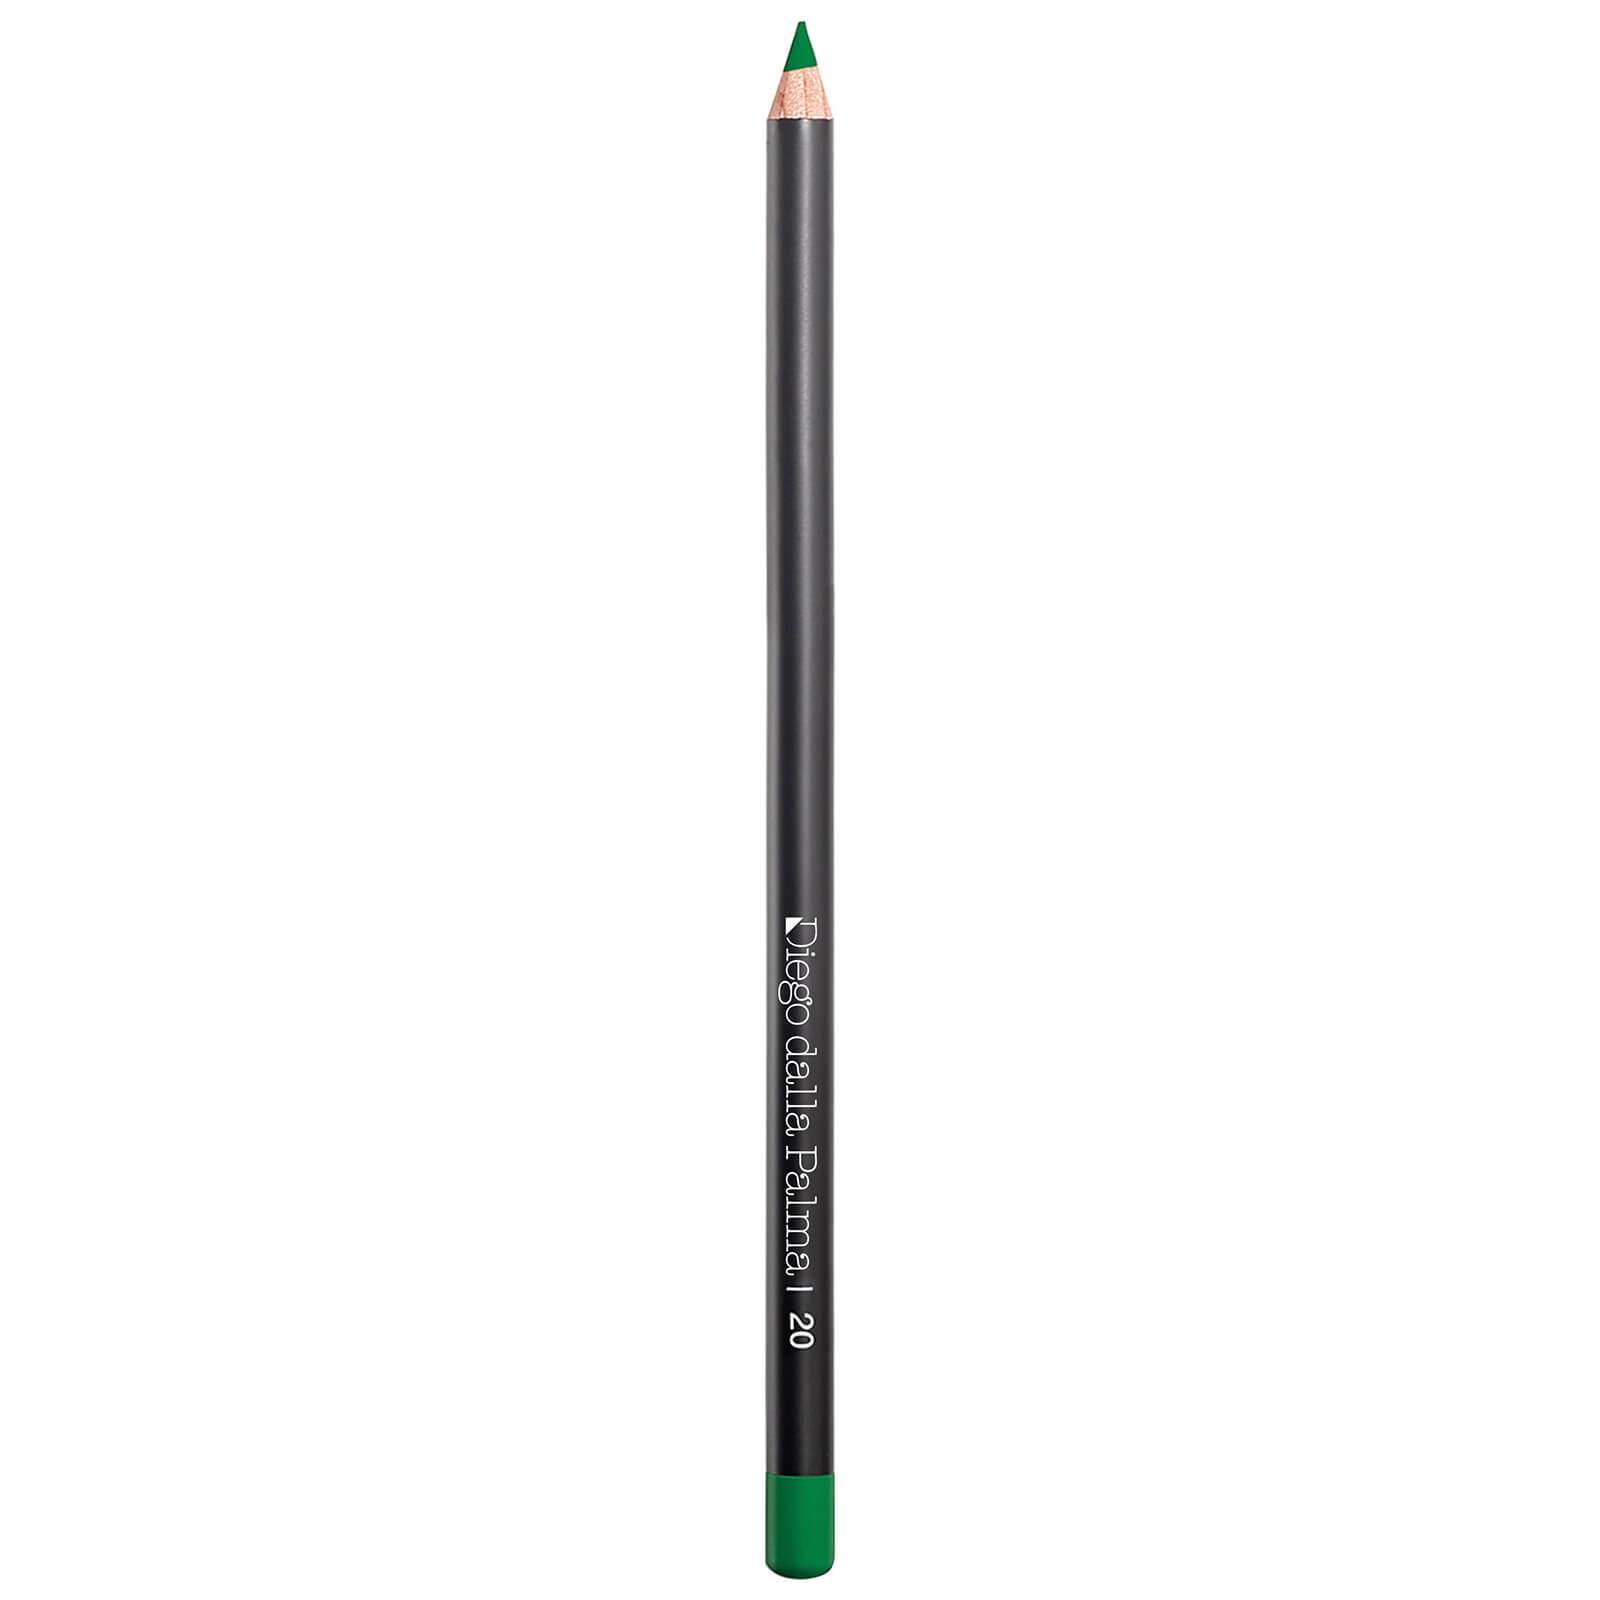 Купить Карандаш для глаз diego dalla palma Eye Pencil 2, 5 мл (различные оттенки) - 20 Emerald Green